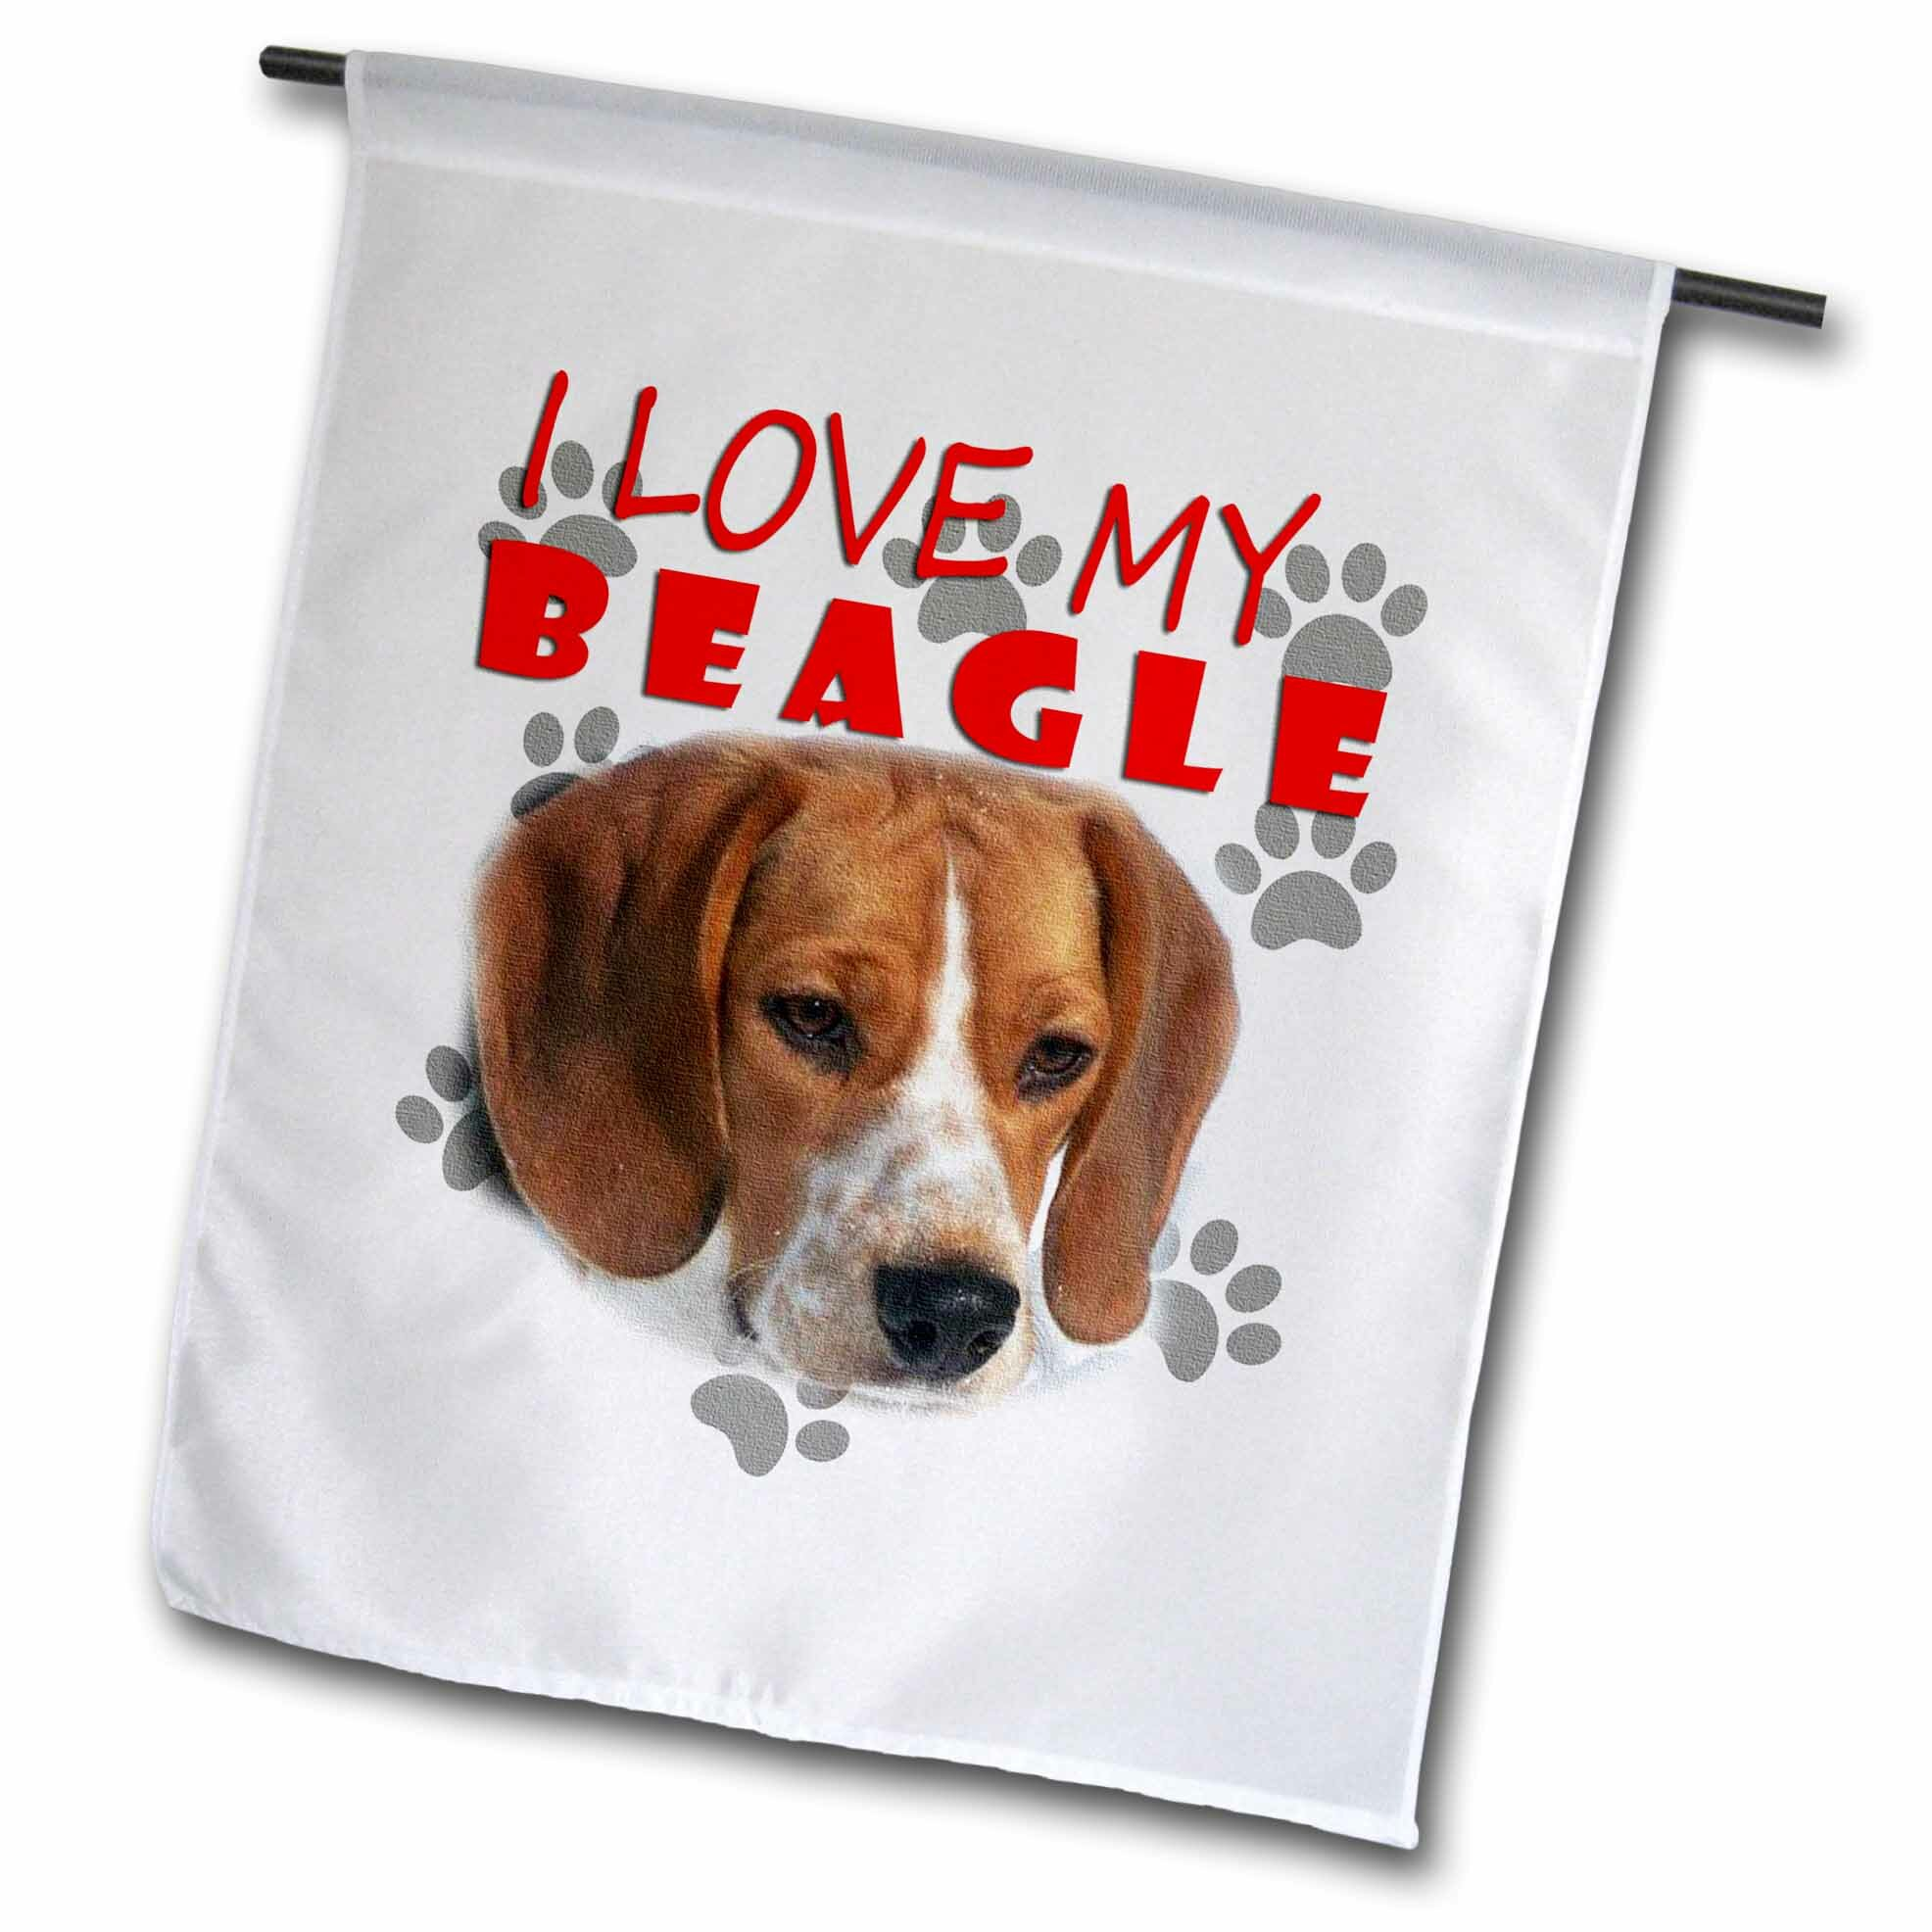 I Love My Beagle Canvas Cute Puppy